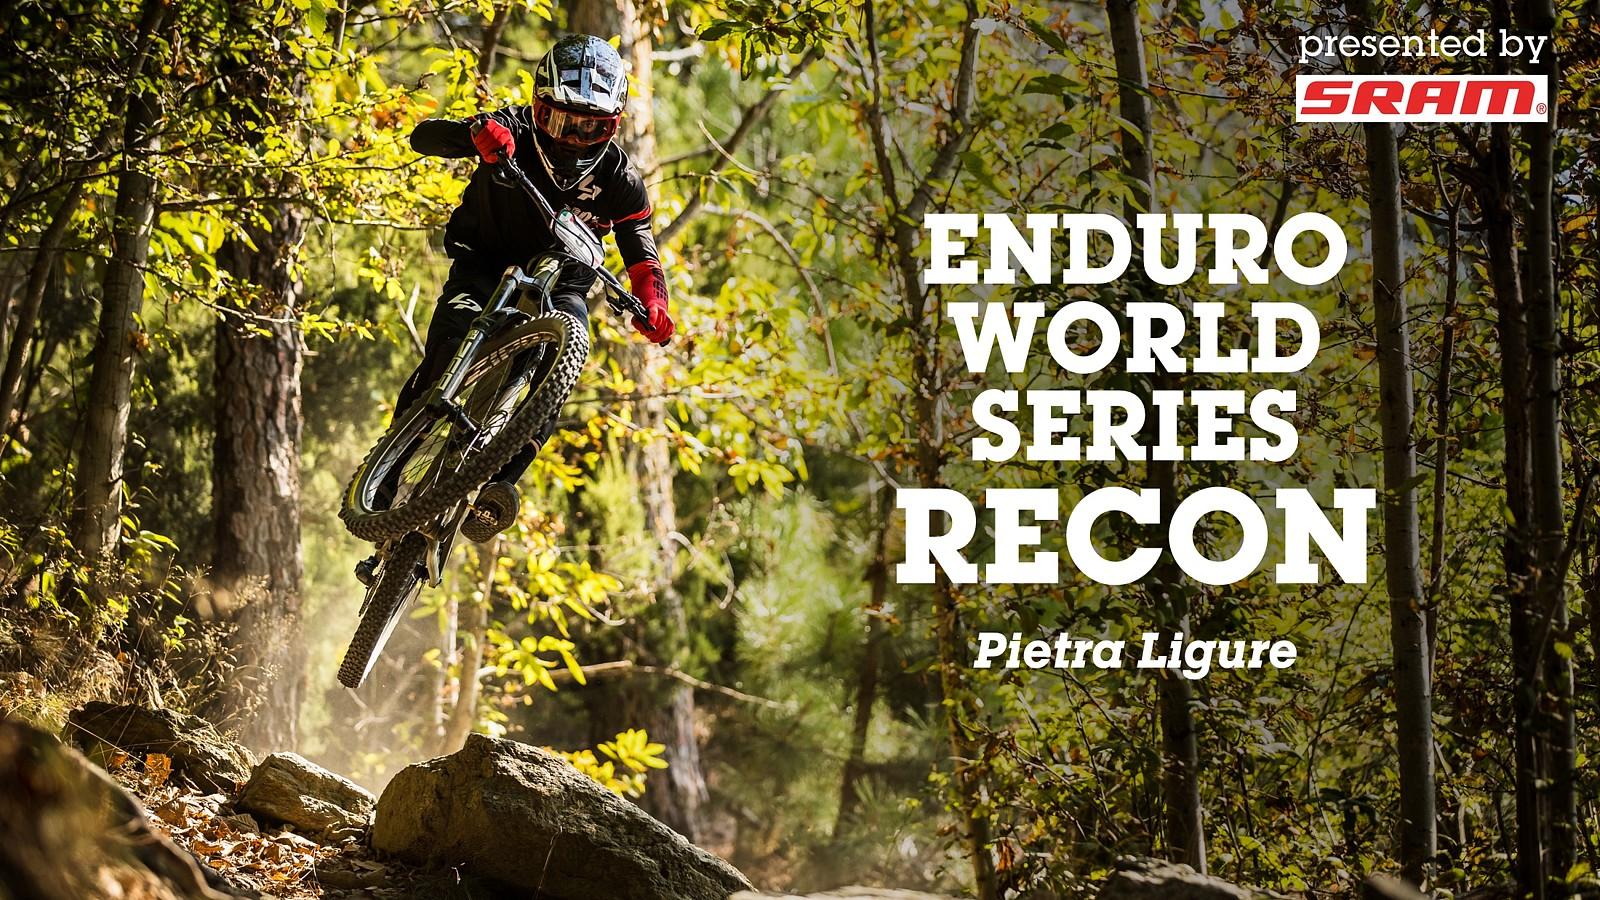 2020 Enduro World Series Recon - Pietra Ligure, Italy - 2020 Enduro World Series Recon - Pietra Ligure, Italy - Mountain Biking Pictures - Vital MTB